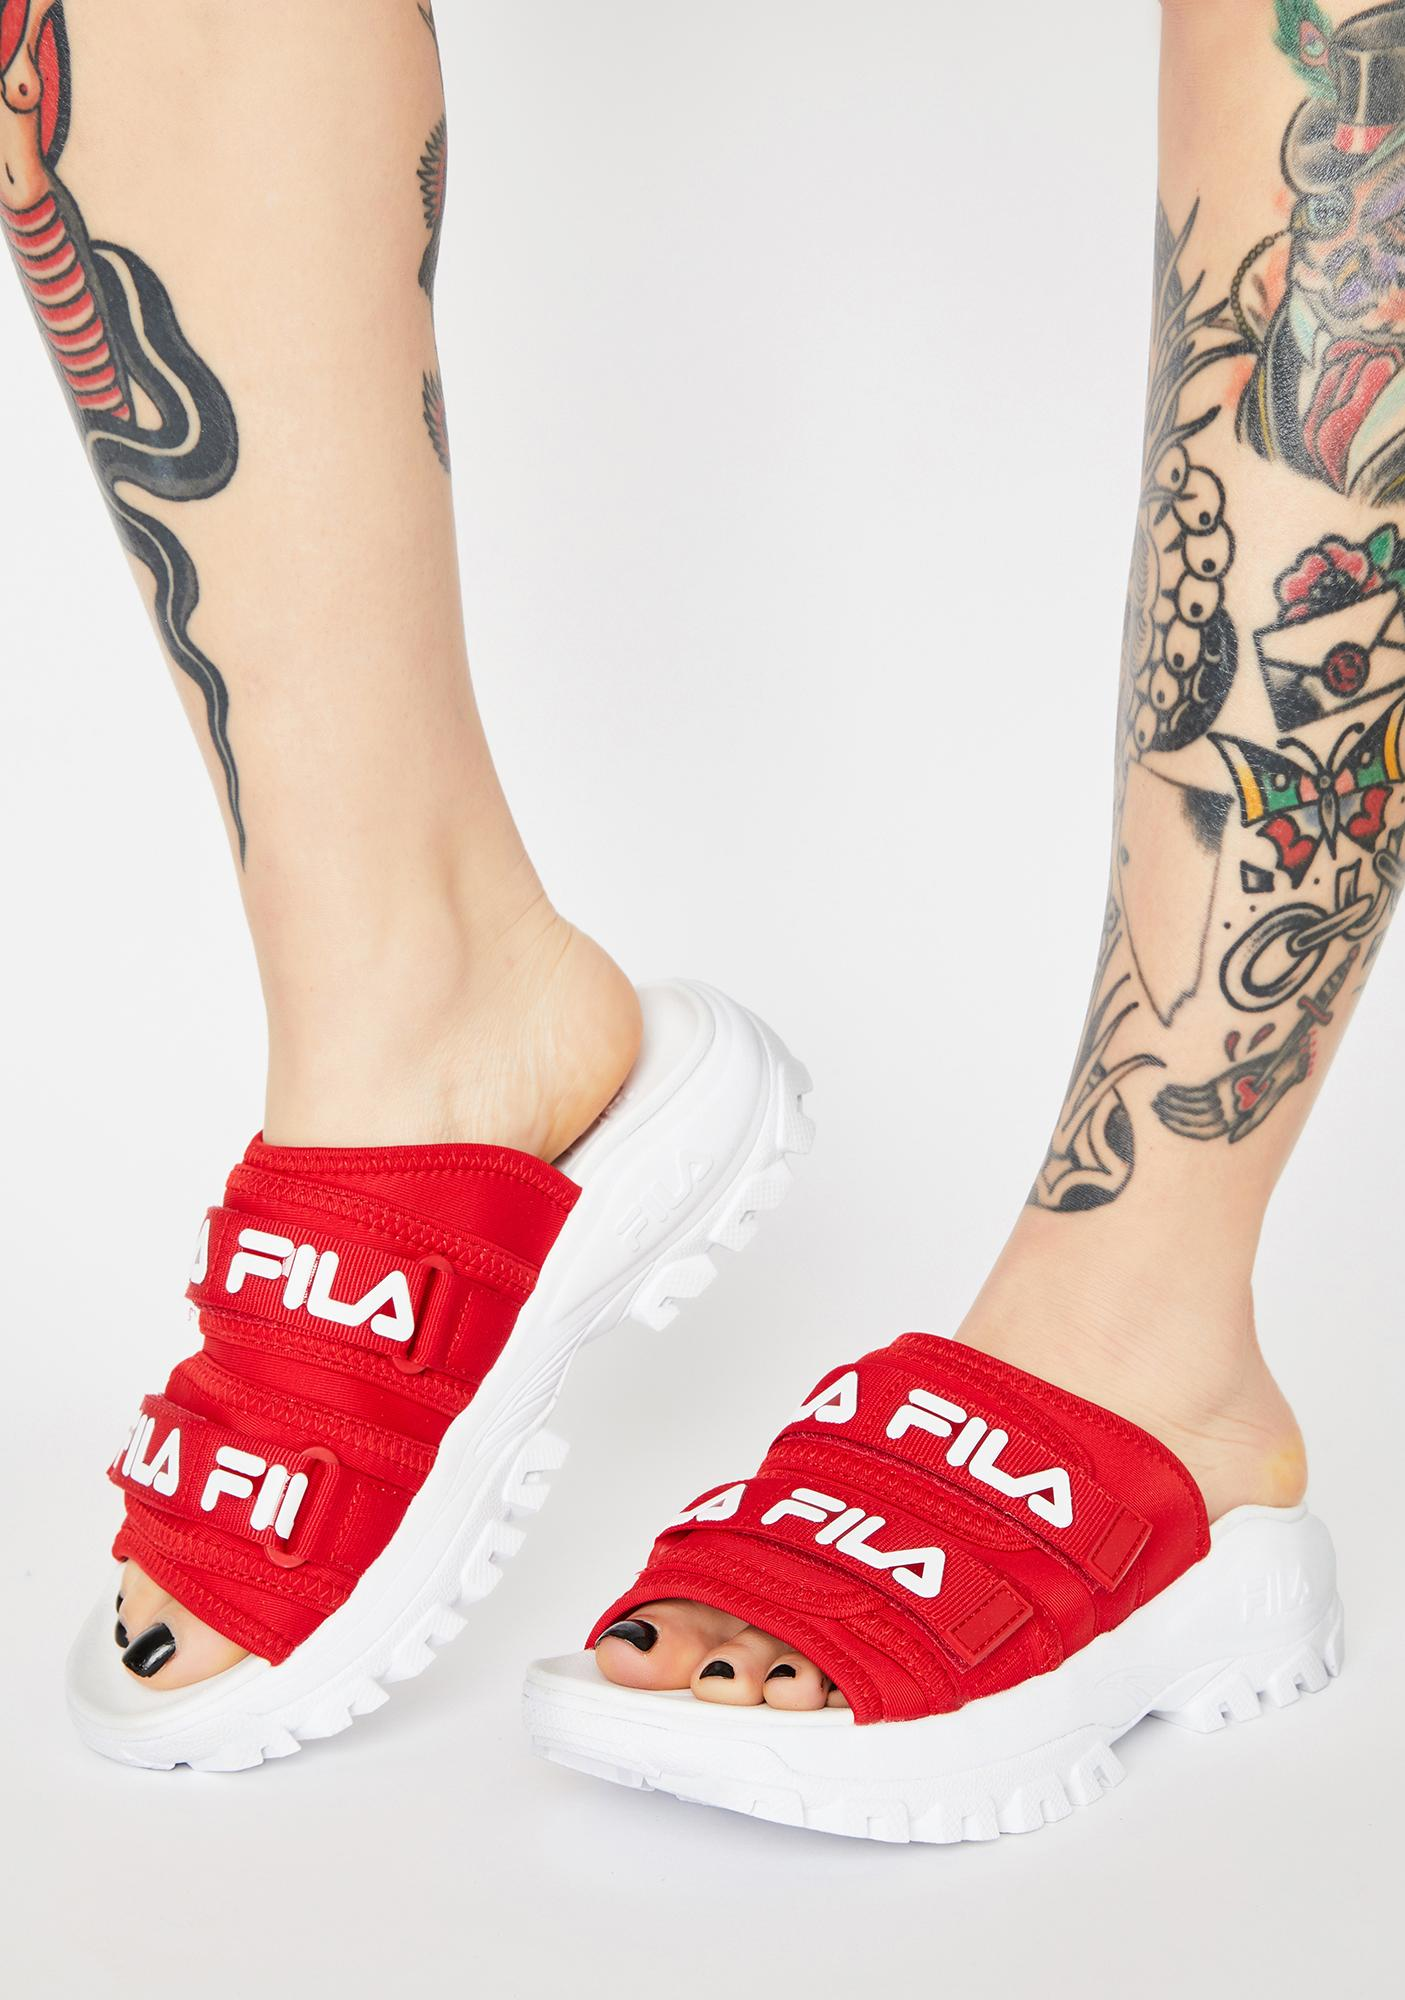 Fila Red Outdoor Slides